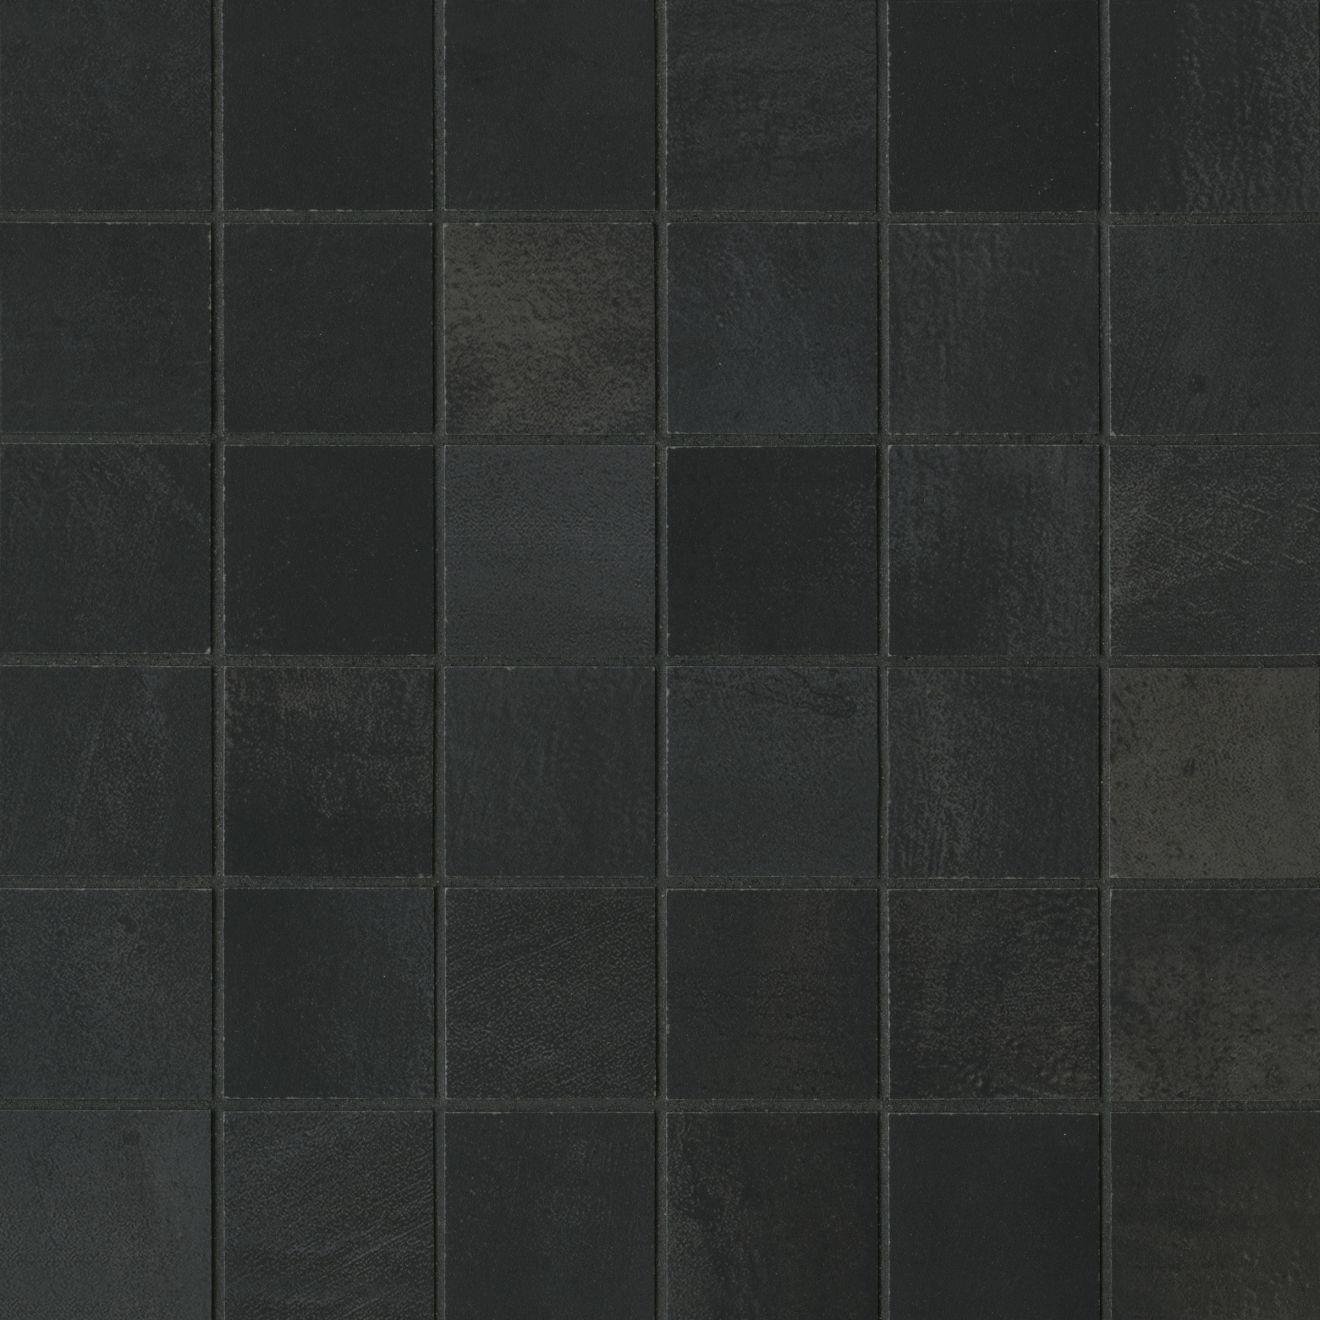 "Chateau 2"" x 2"" Floor & Wall Mosaic in Midnight"